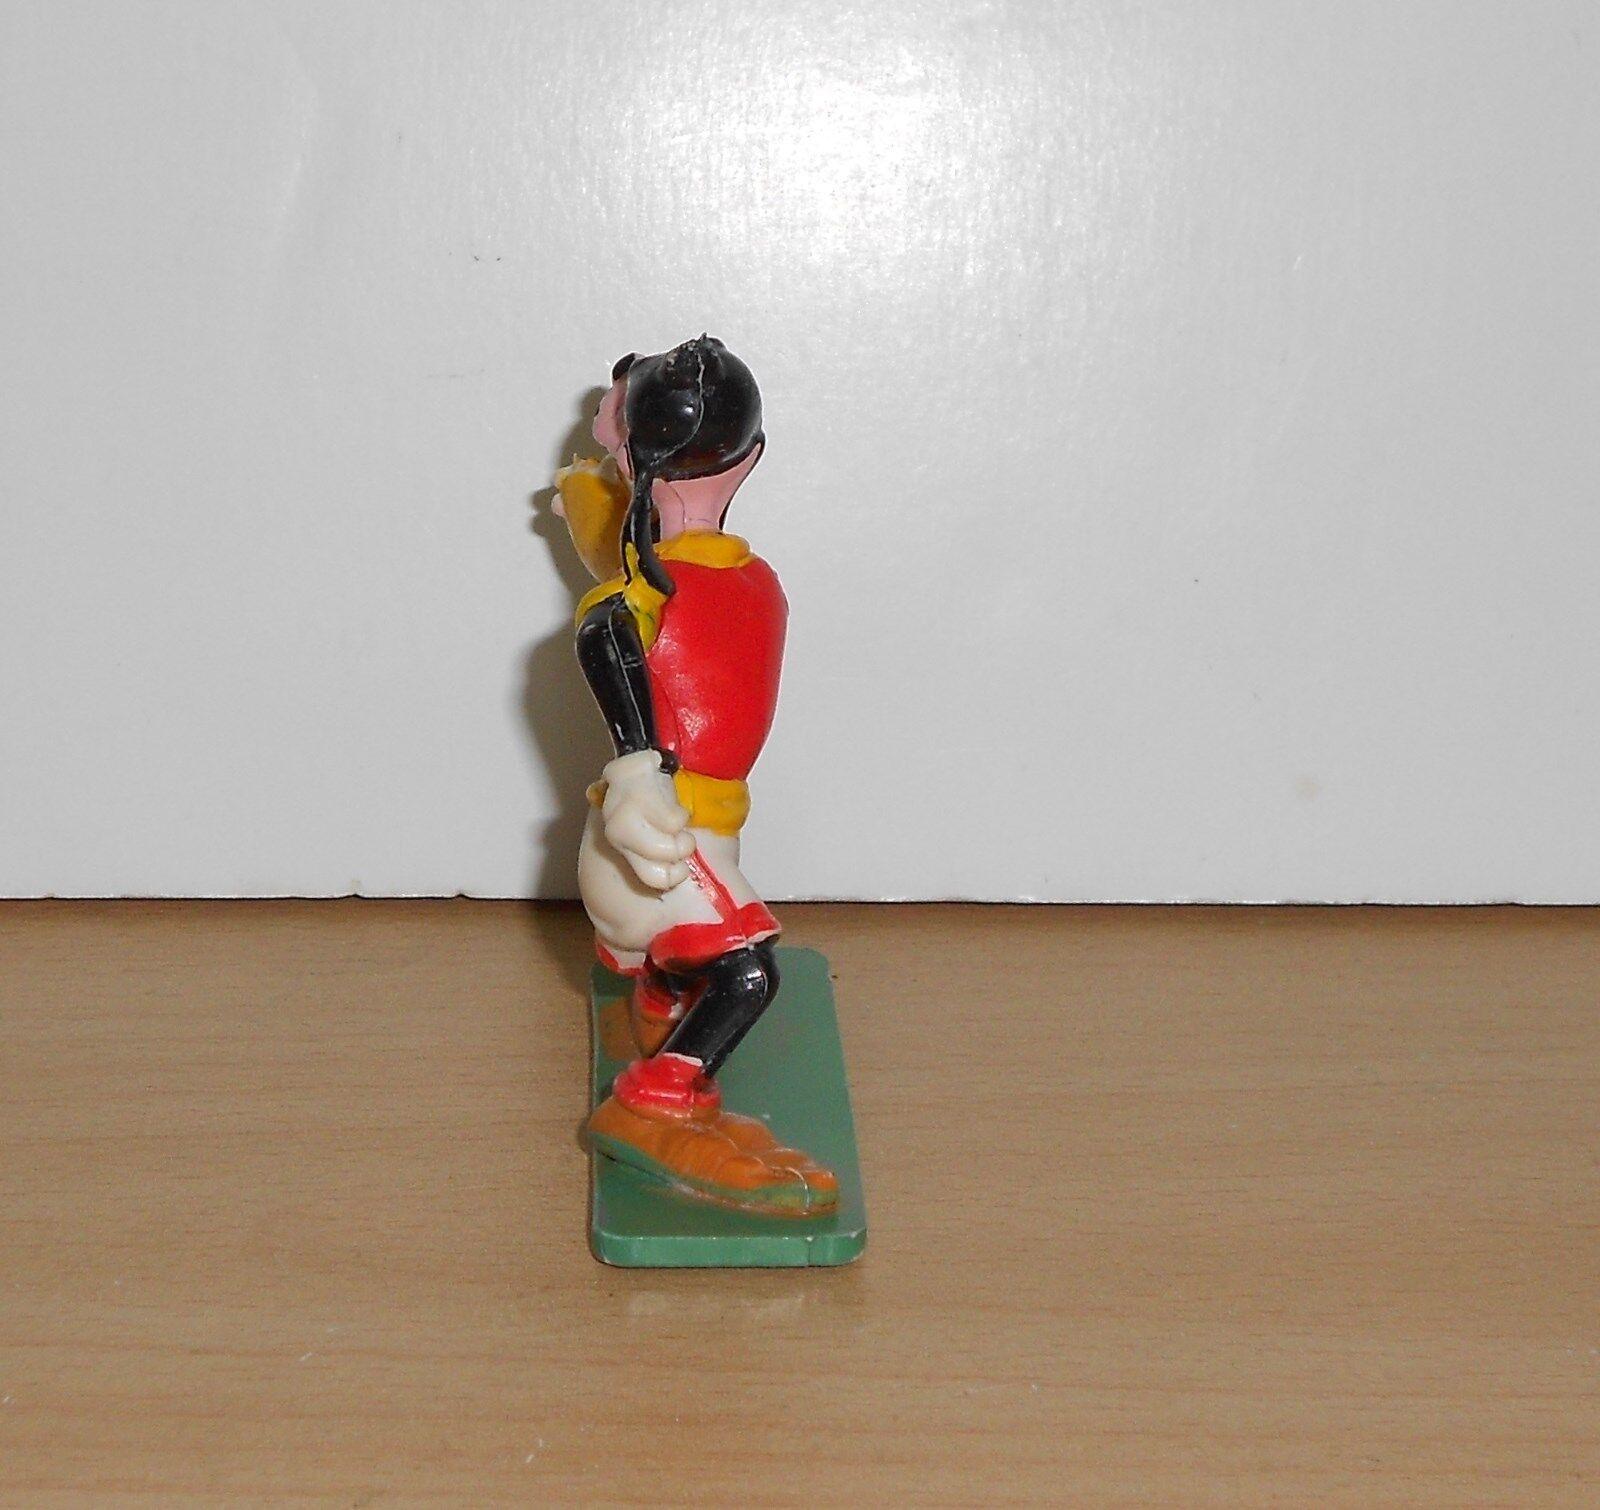 SPORT GOOFY FIGURE FIGURE FIGURE Figurine PVC HEIMO DISCUS THROW Olympics Games 70's 11c39f